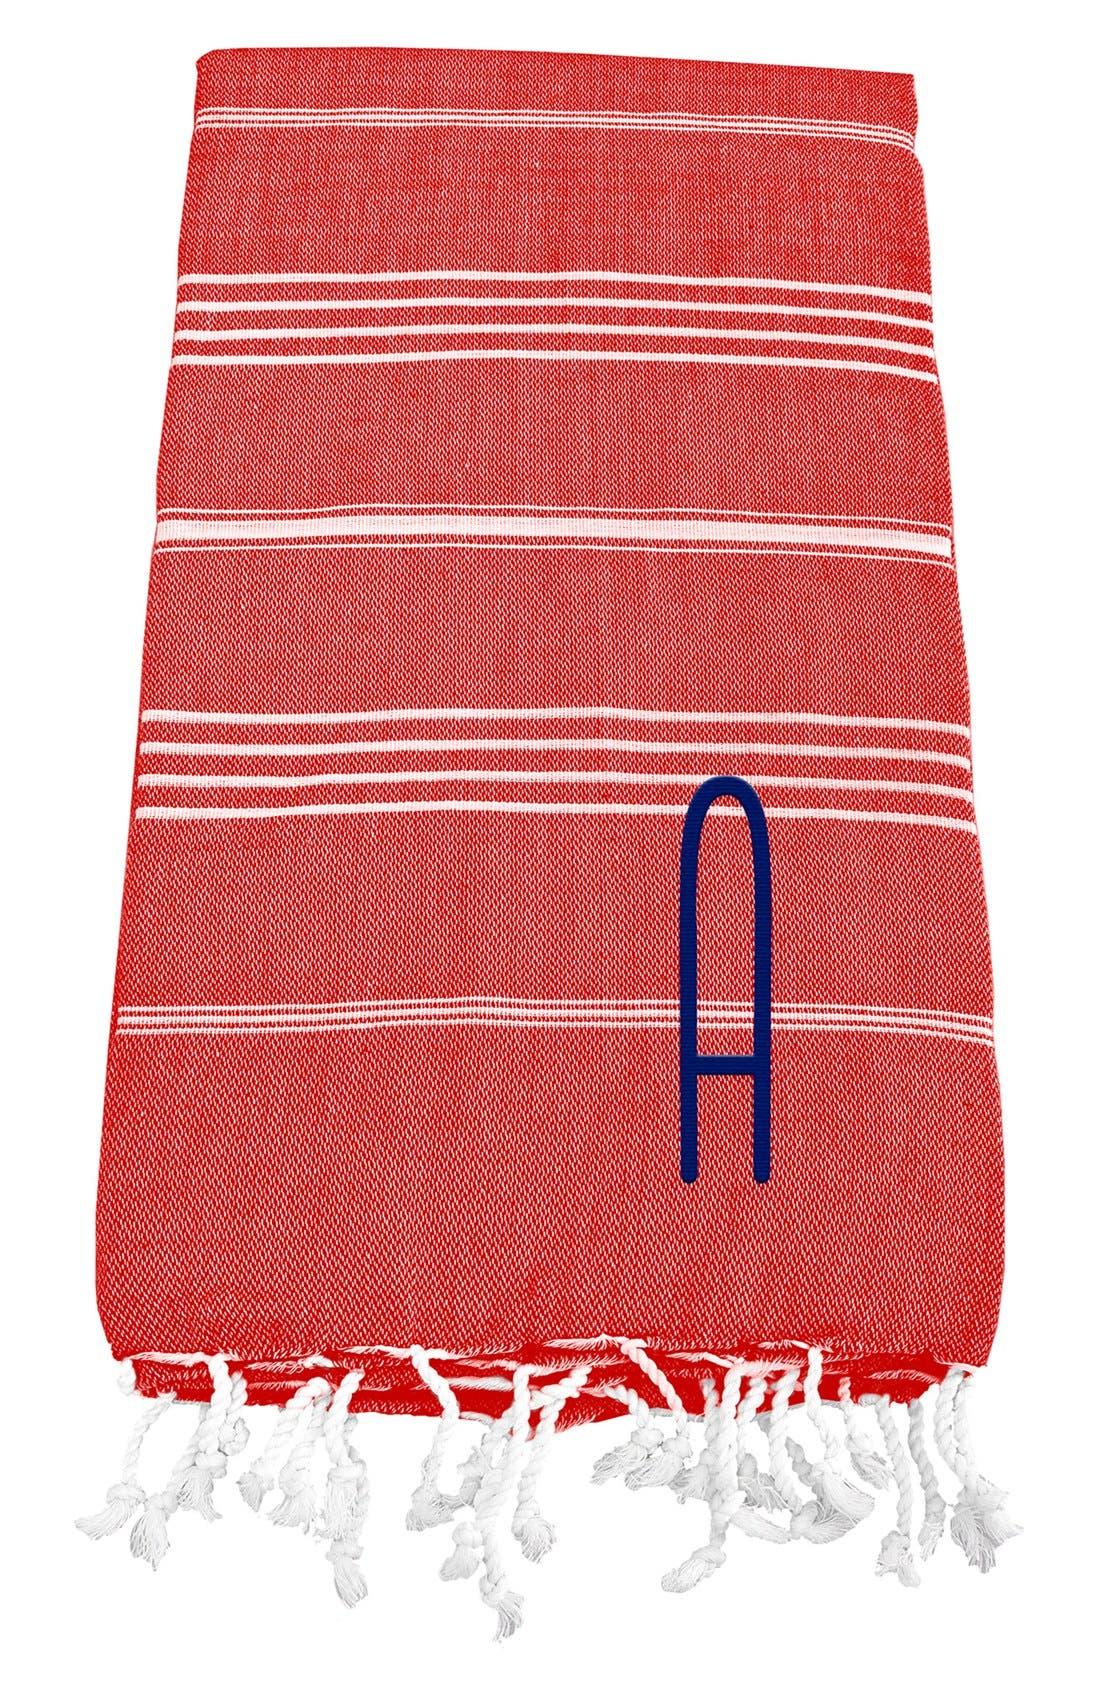 Monogram Turkish Cotton Towel,                             Main thumbnail 110, color,